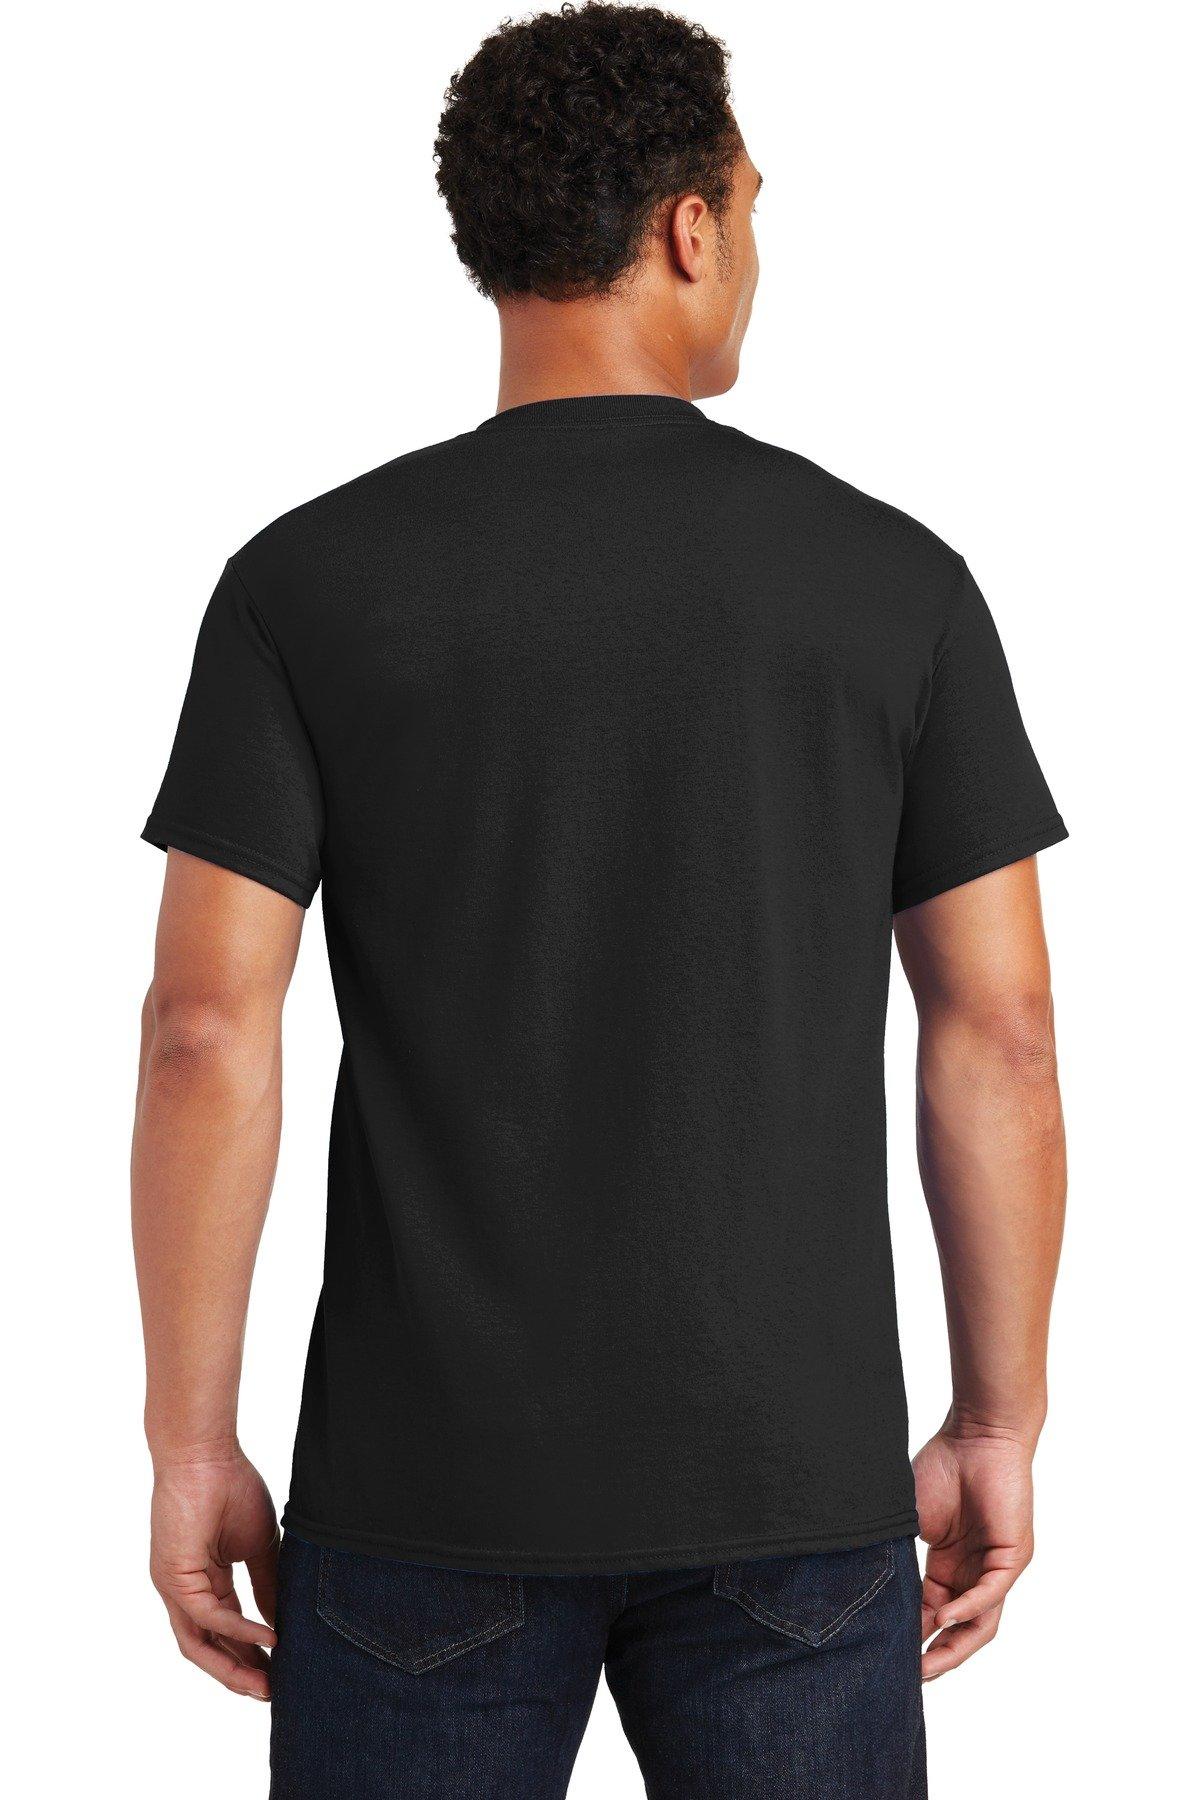 Gildan Men's Seamless Double Needle T-Shirt, Black, Large. (Pack of 5) by Gildan